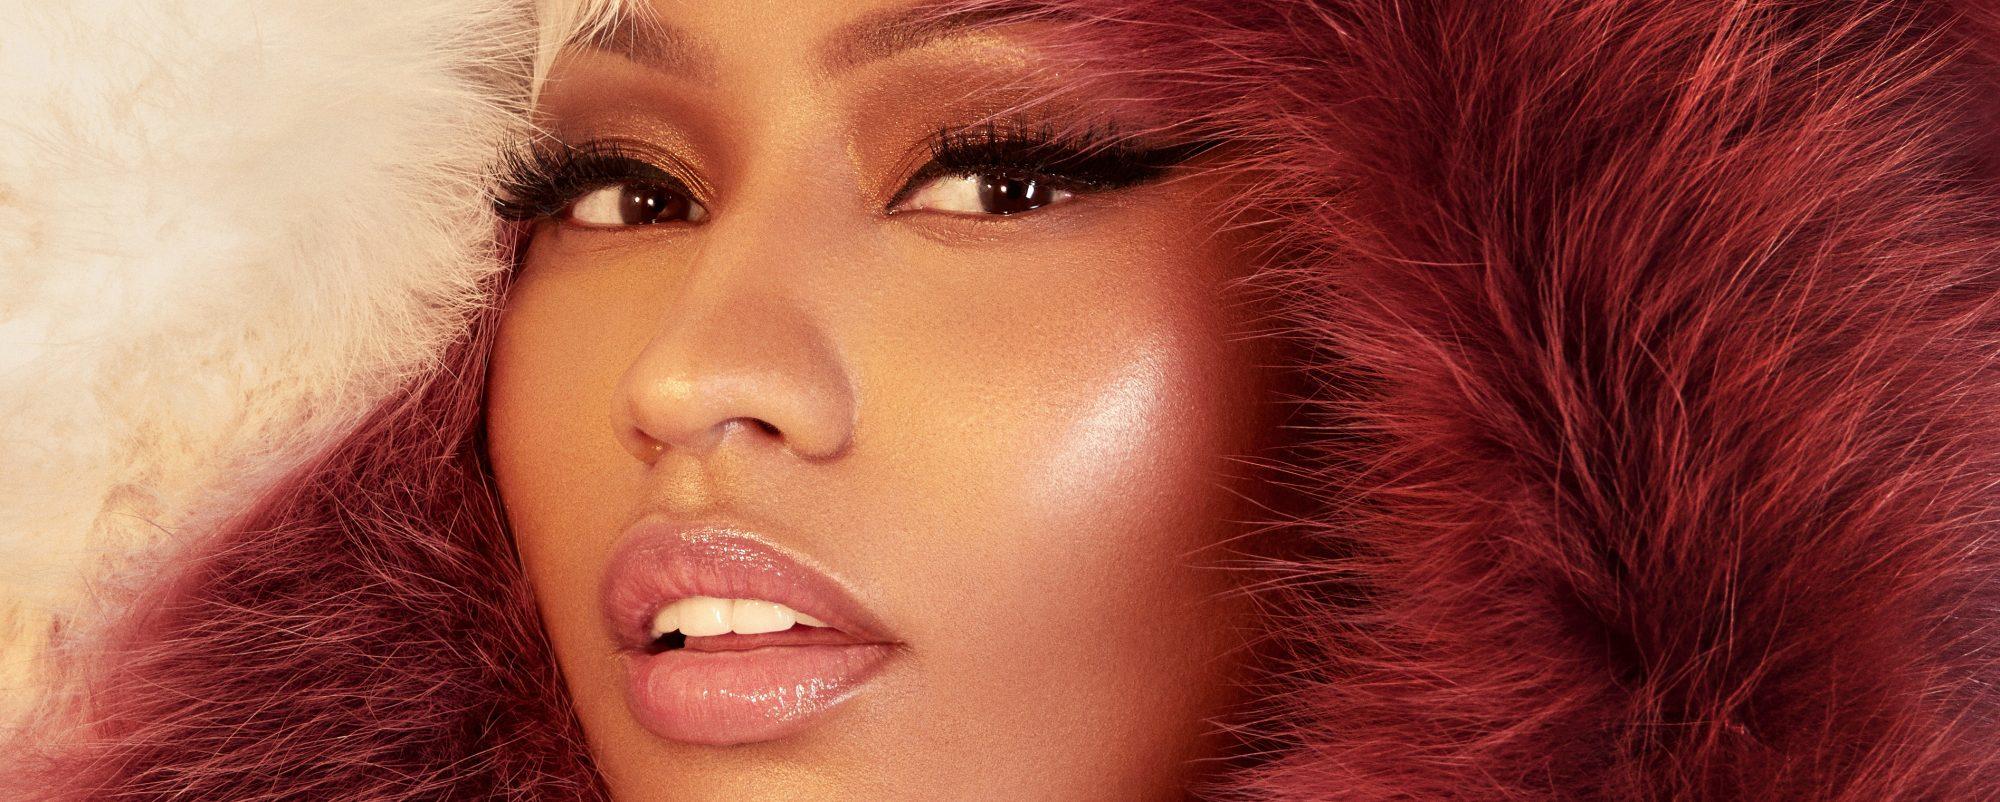 HNM Magazine – Votre source francophone #1 sur Nicki Minaj